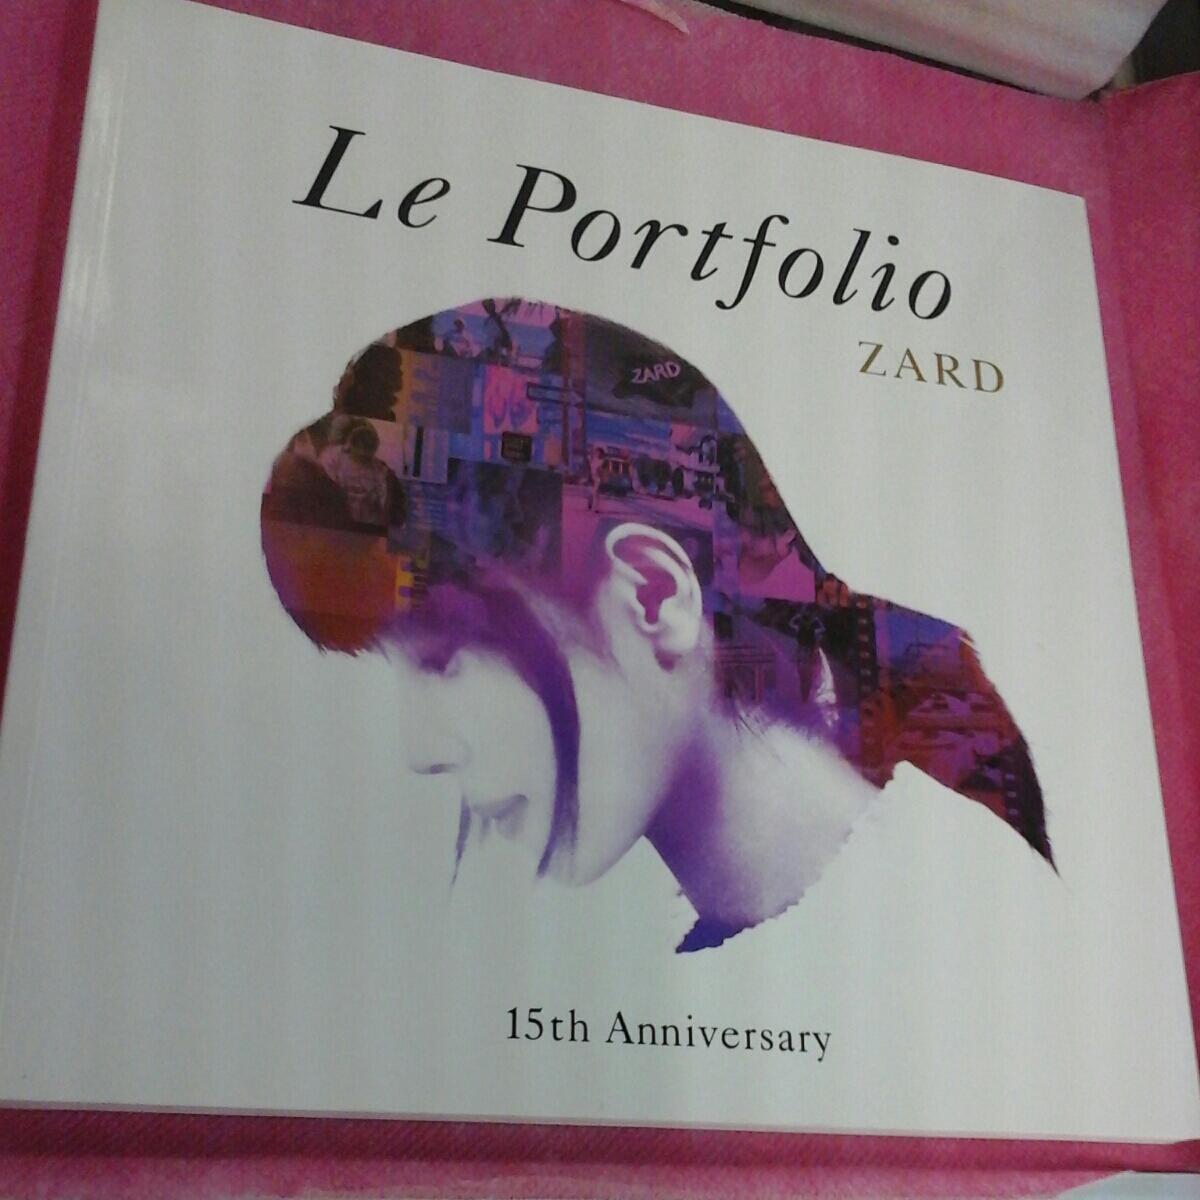 ZARD 15th Anniversary 写真集 Le Portfolio ル・ポルトフォリオ 坂井泉水